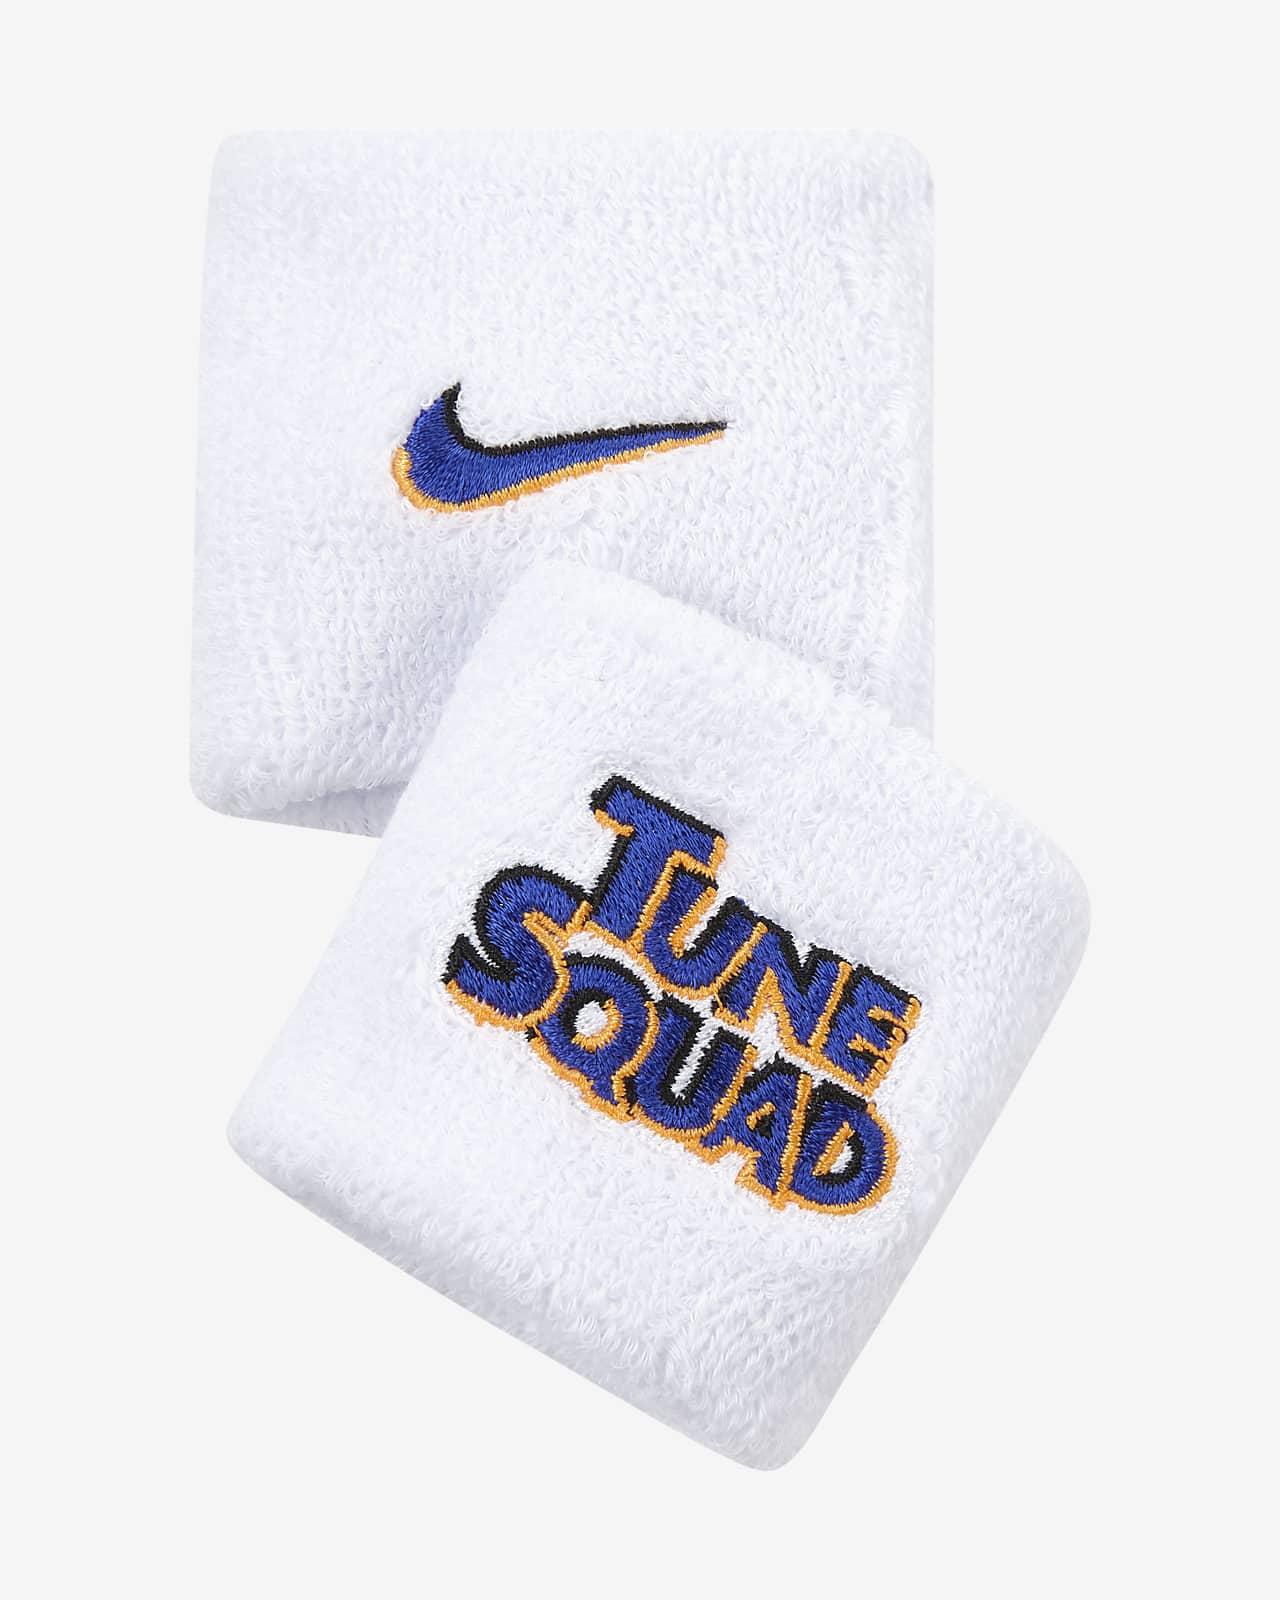 Serre-poignets Nike Swoosh x Space Jam: A New Legacy (lot de 2)